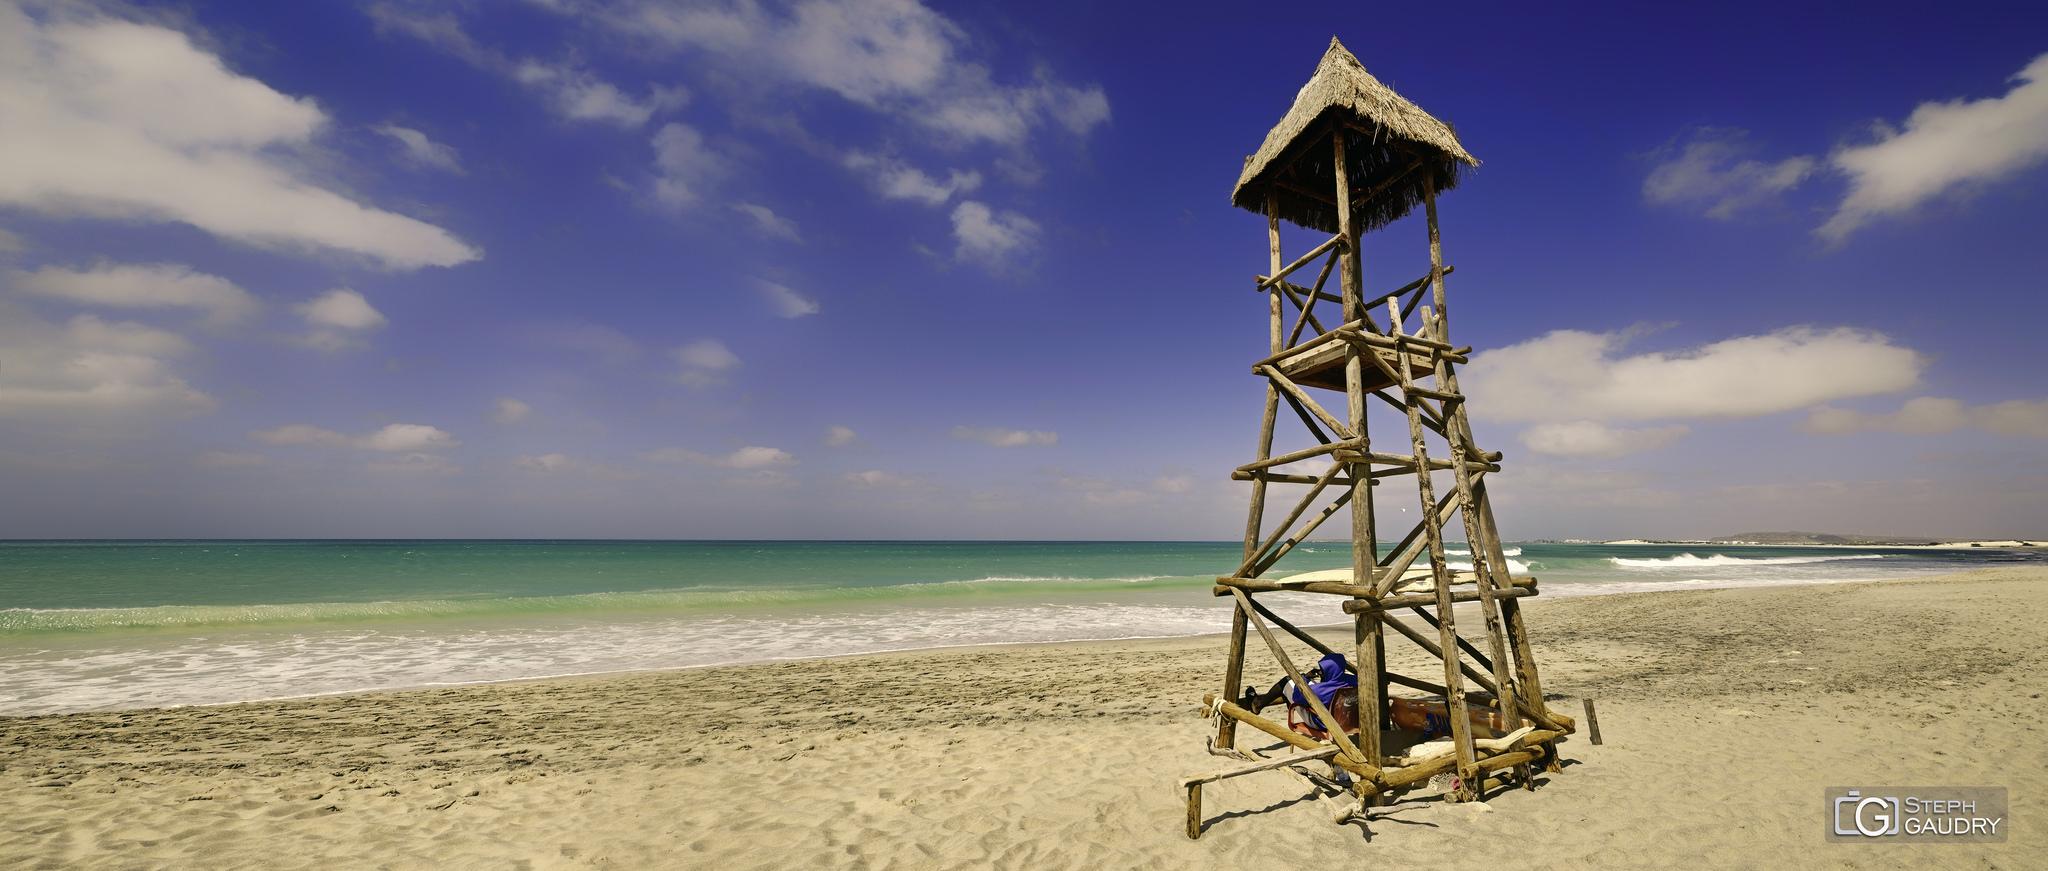 Praia das Dunas [Klik om de diavoorstelling te starten]